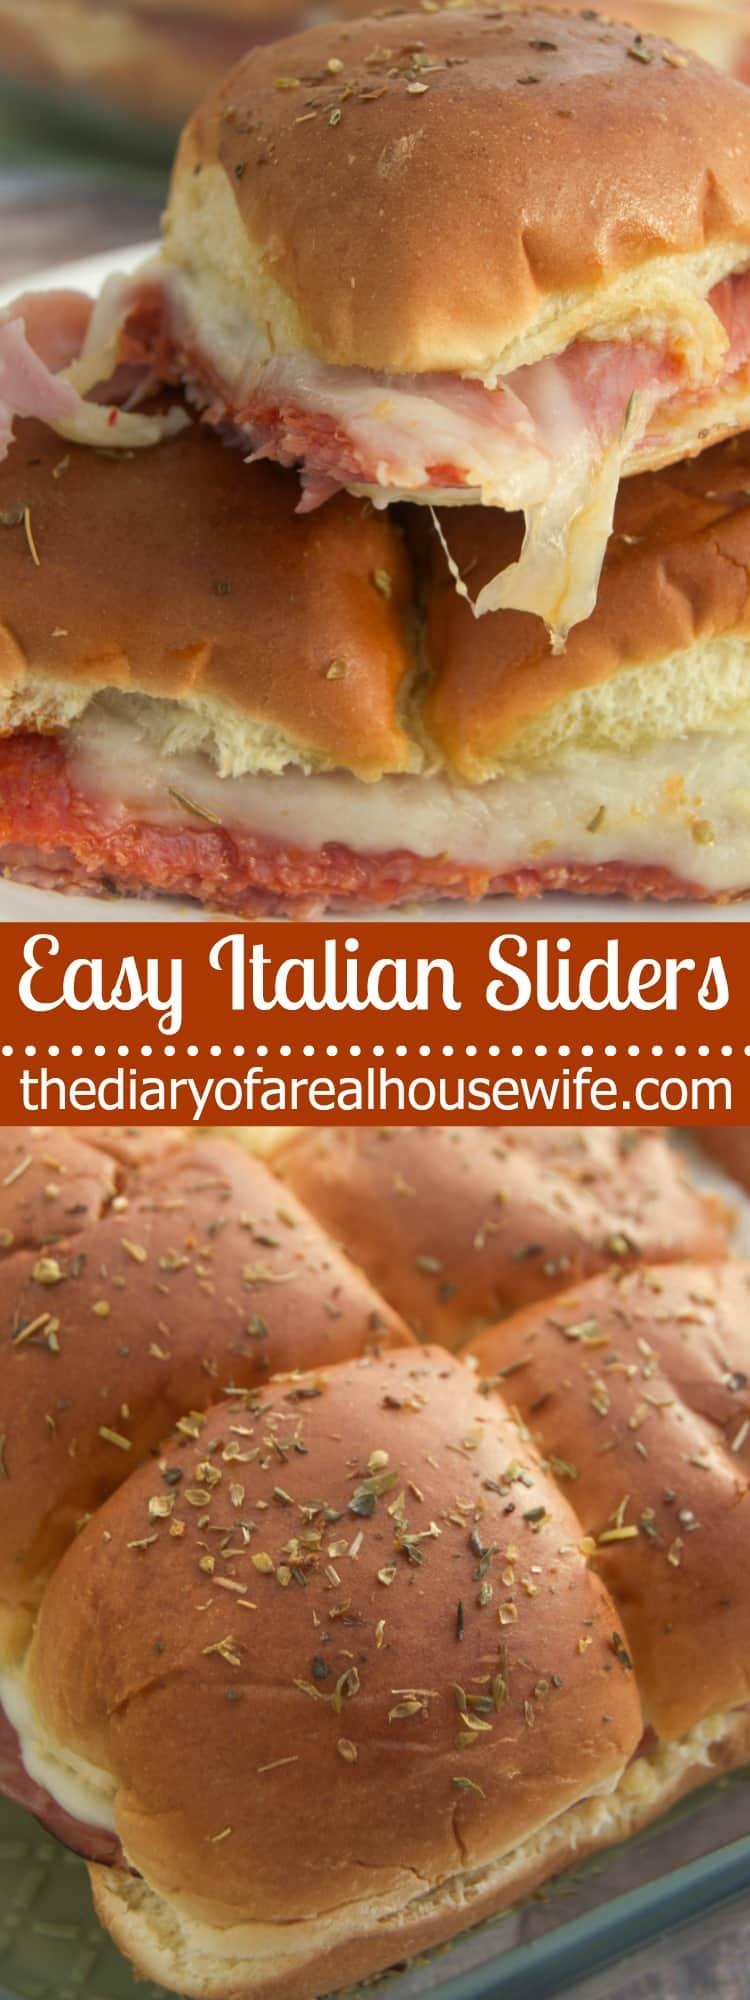 Easy Italian Sliders